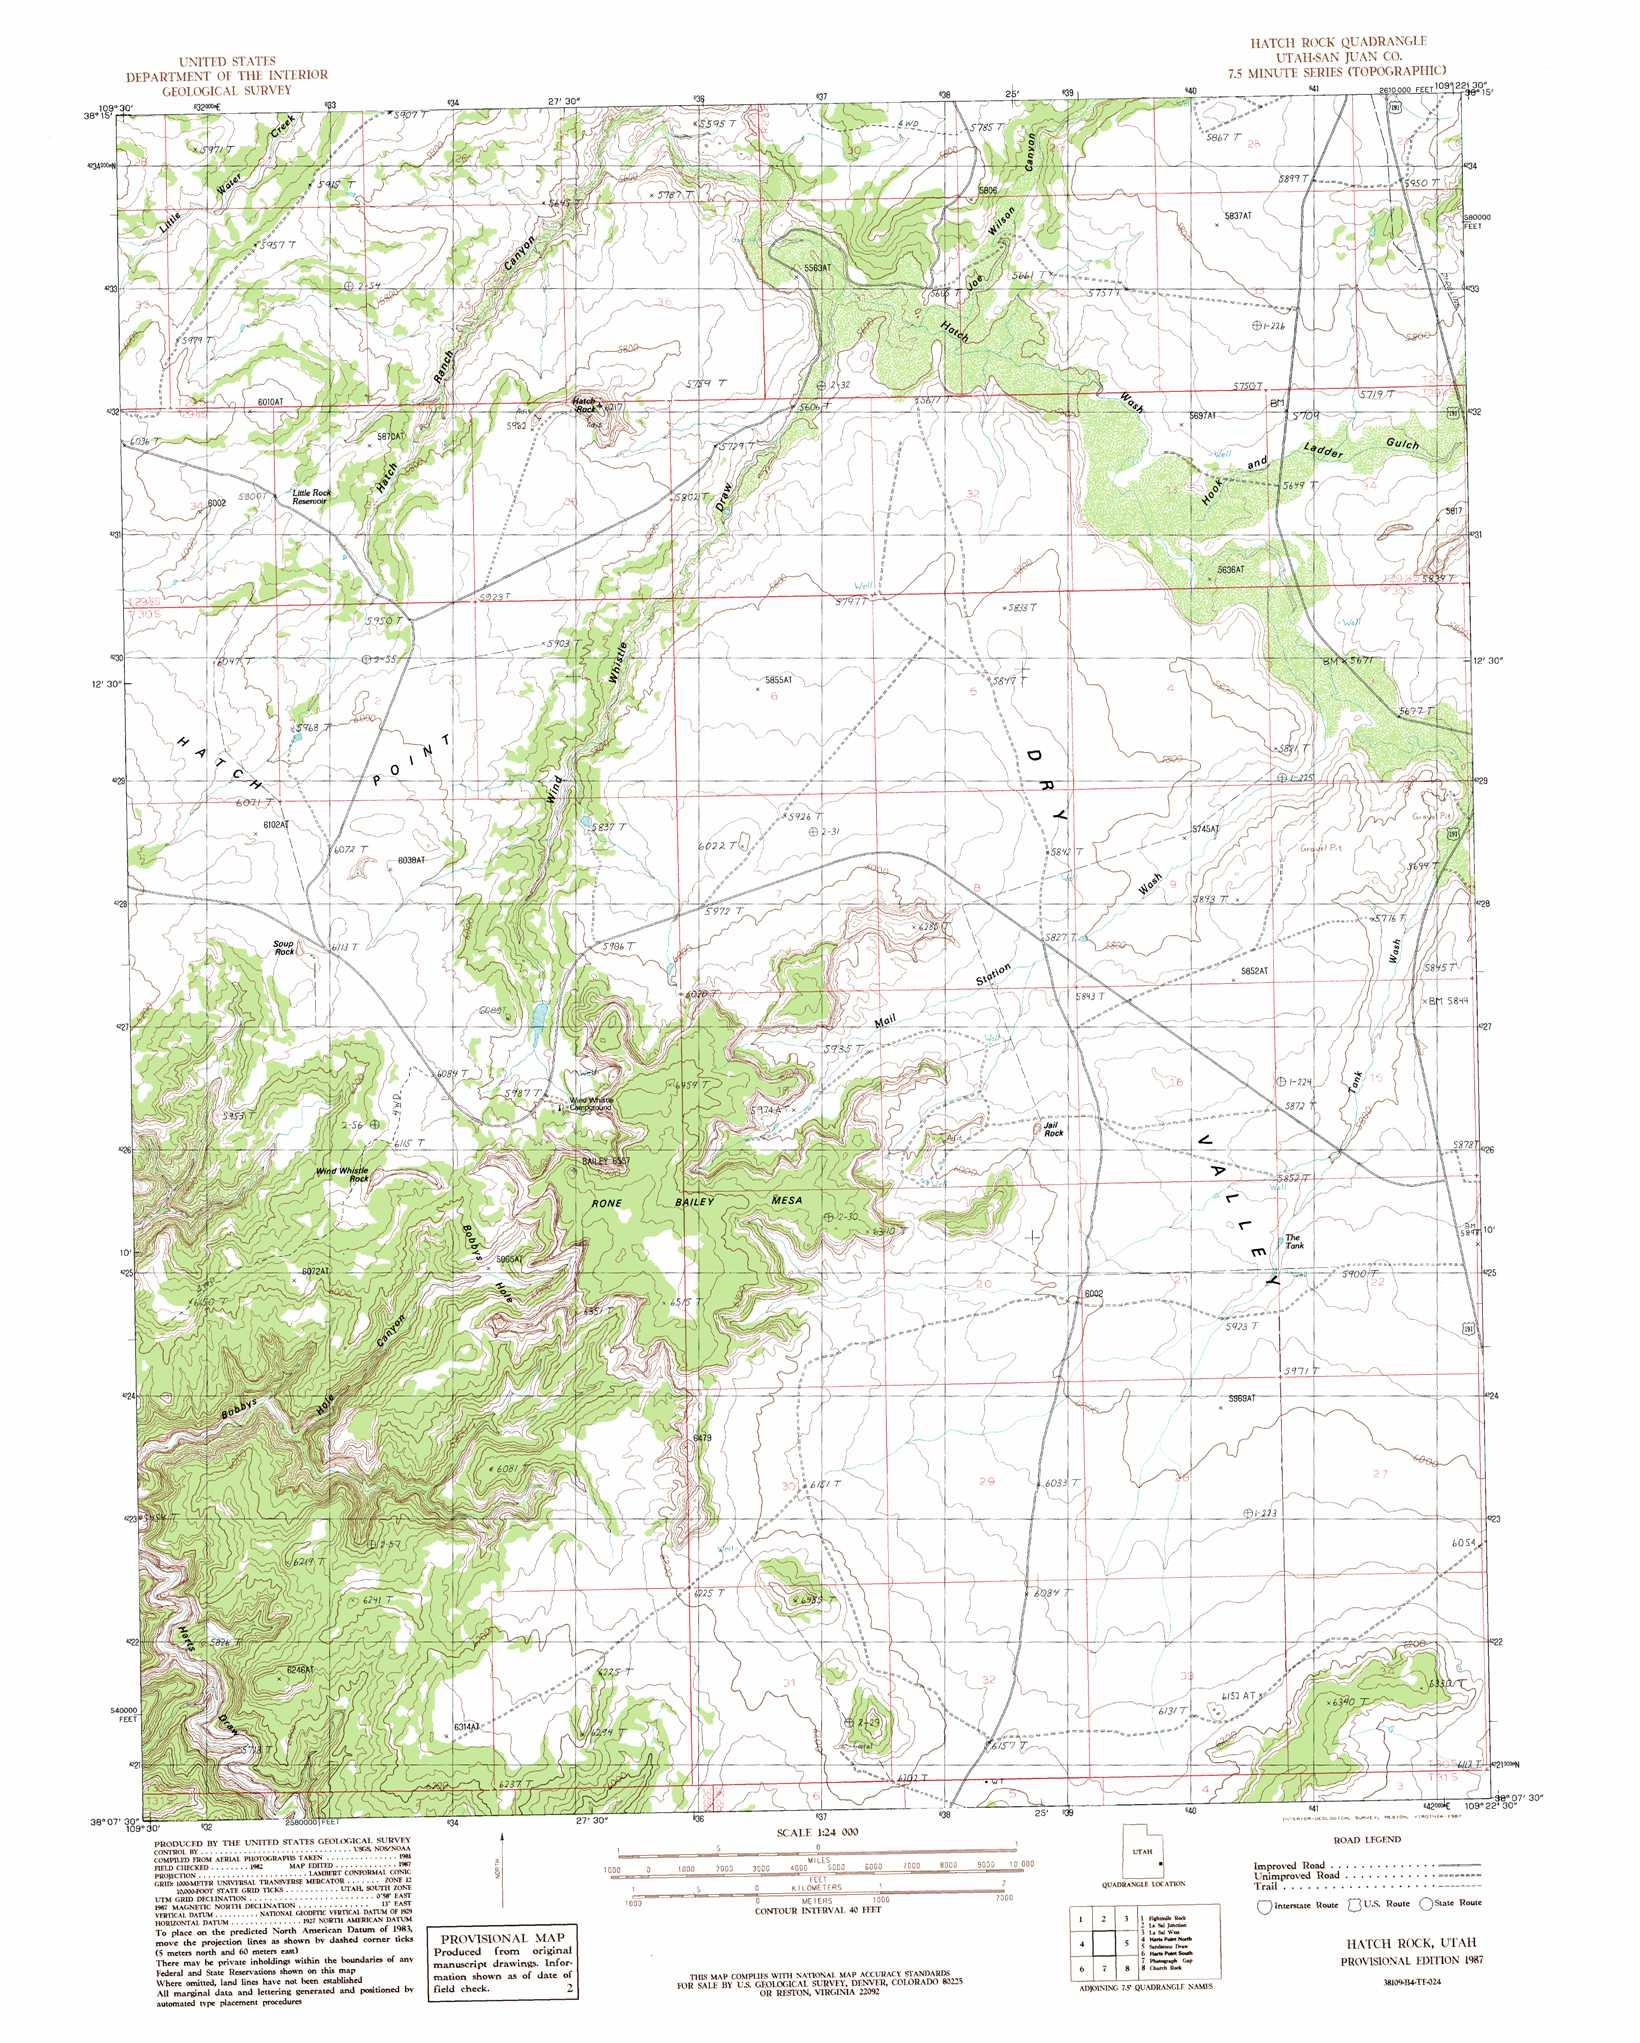 Hatch Rock topographic map UT USGS Topo Quad 38109b4